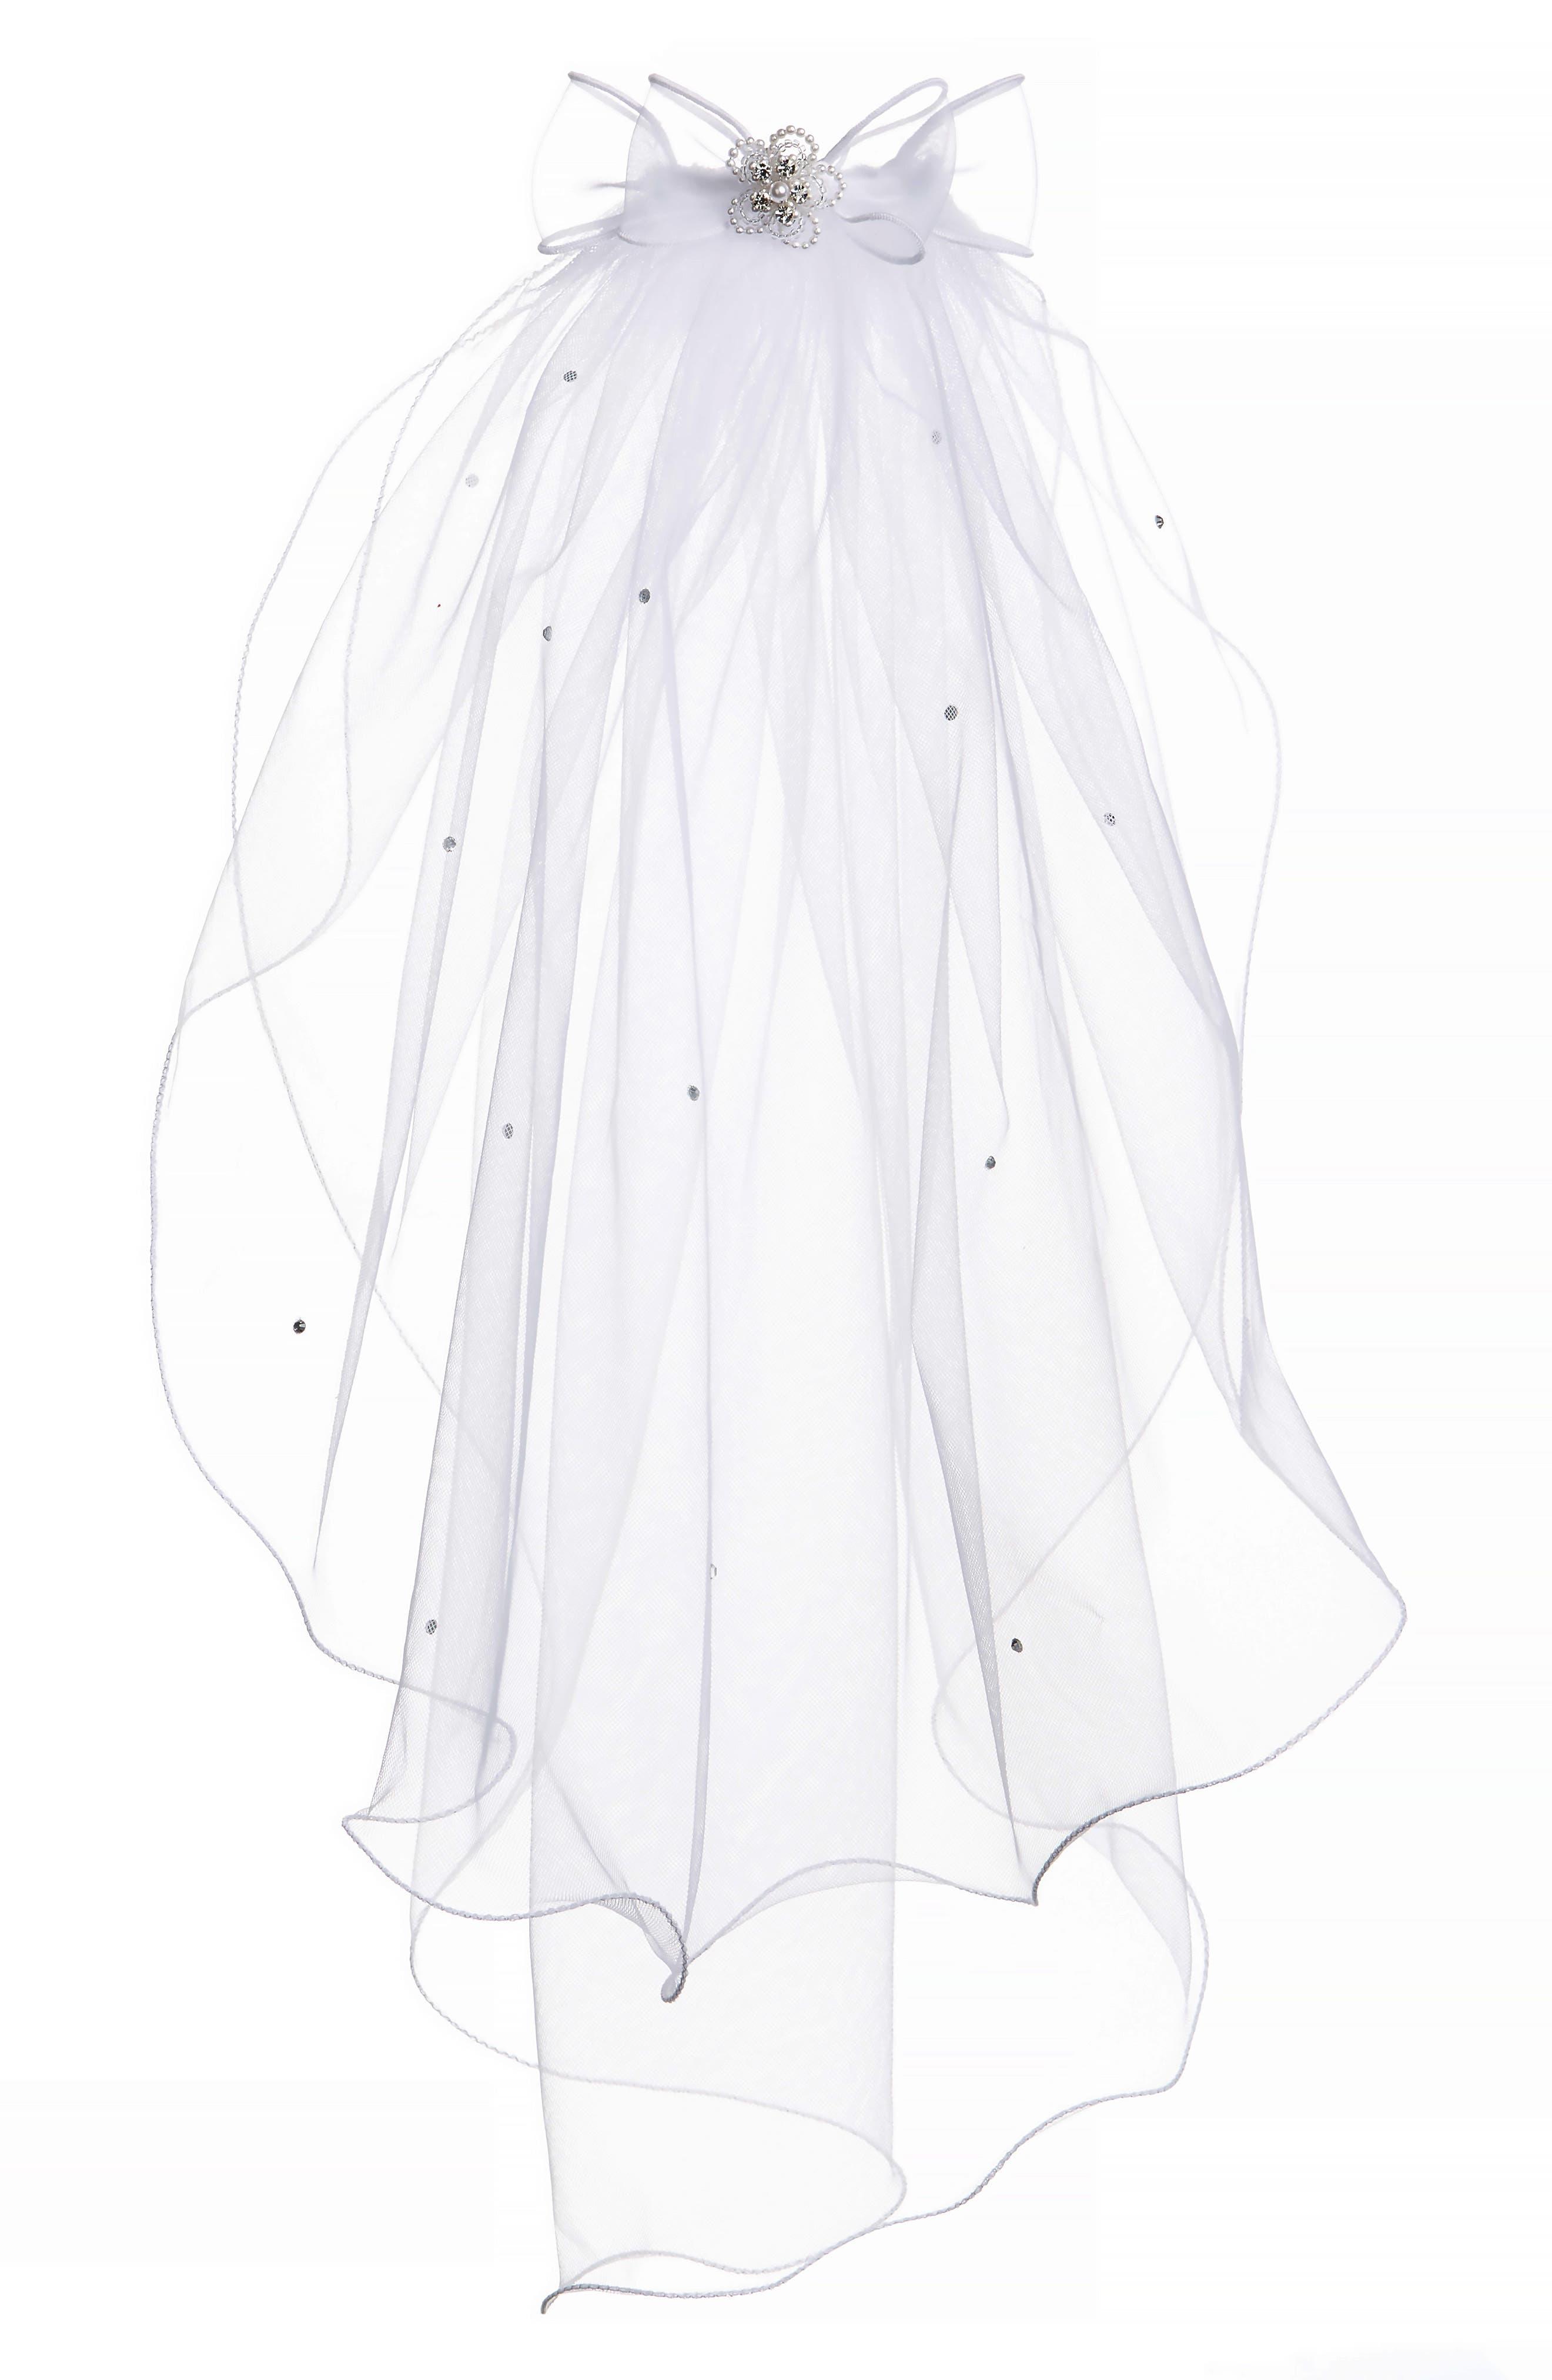 Alternate Image 1 Selected - Lauren Marie Beaded Bow & Veil (Big Girls)